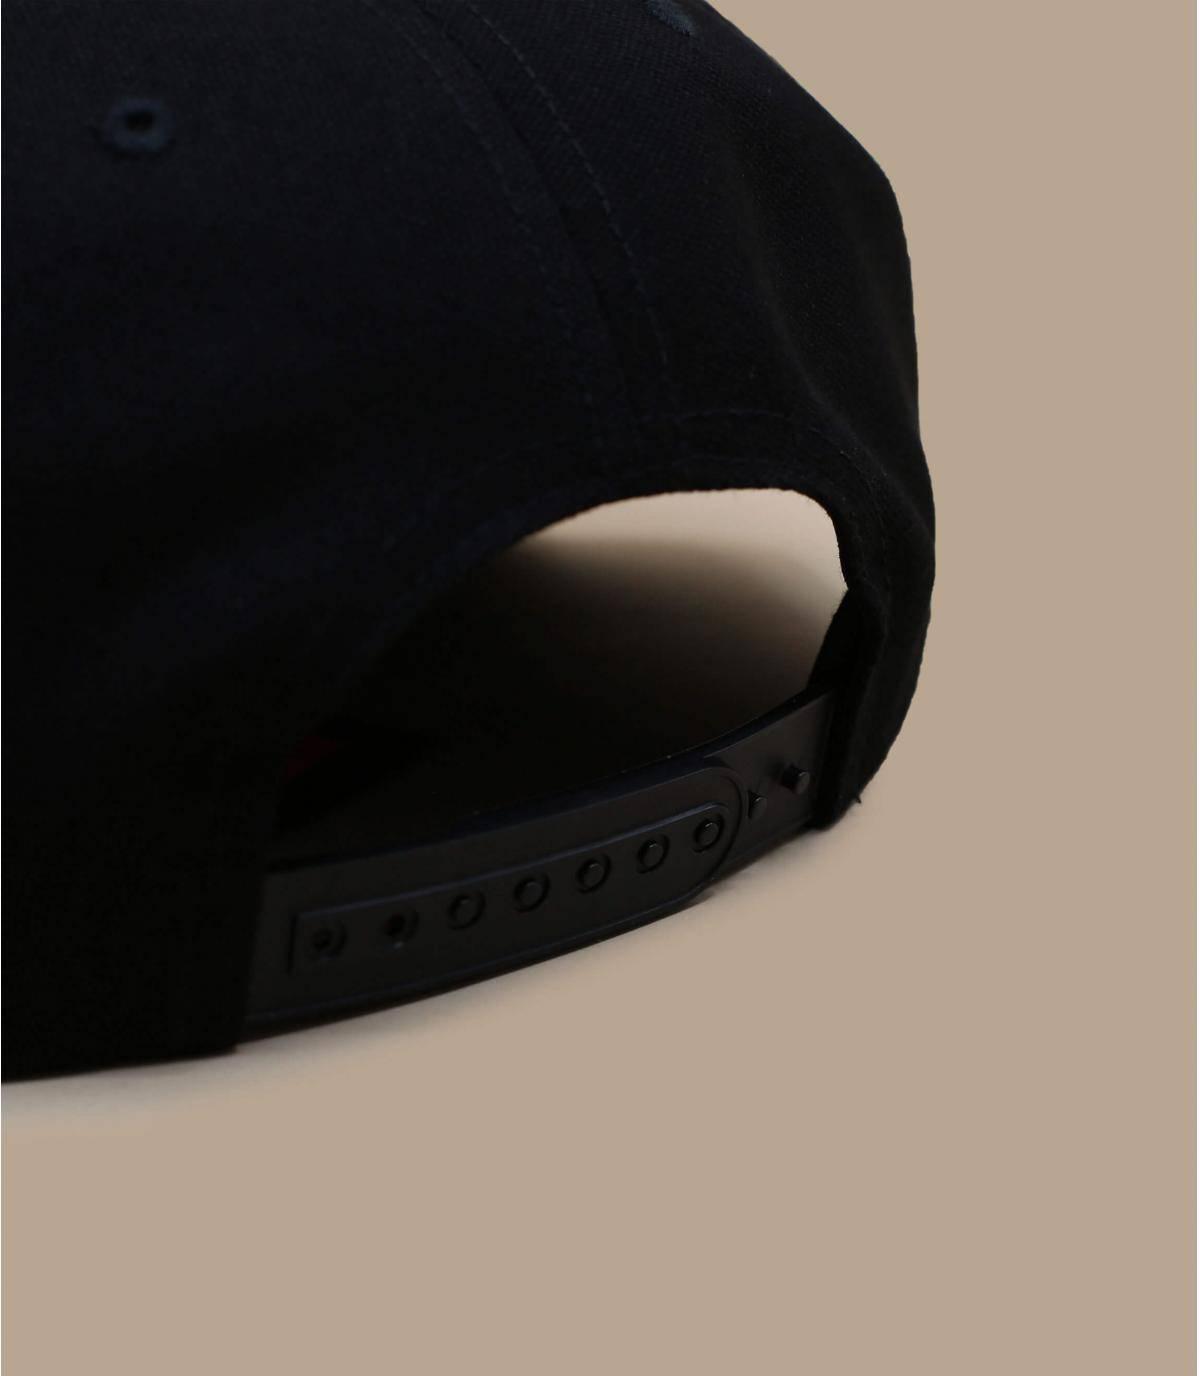 Details Alton Snapback black tan suede - Abbildung 3